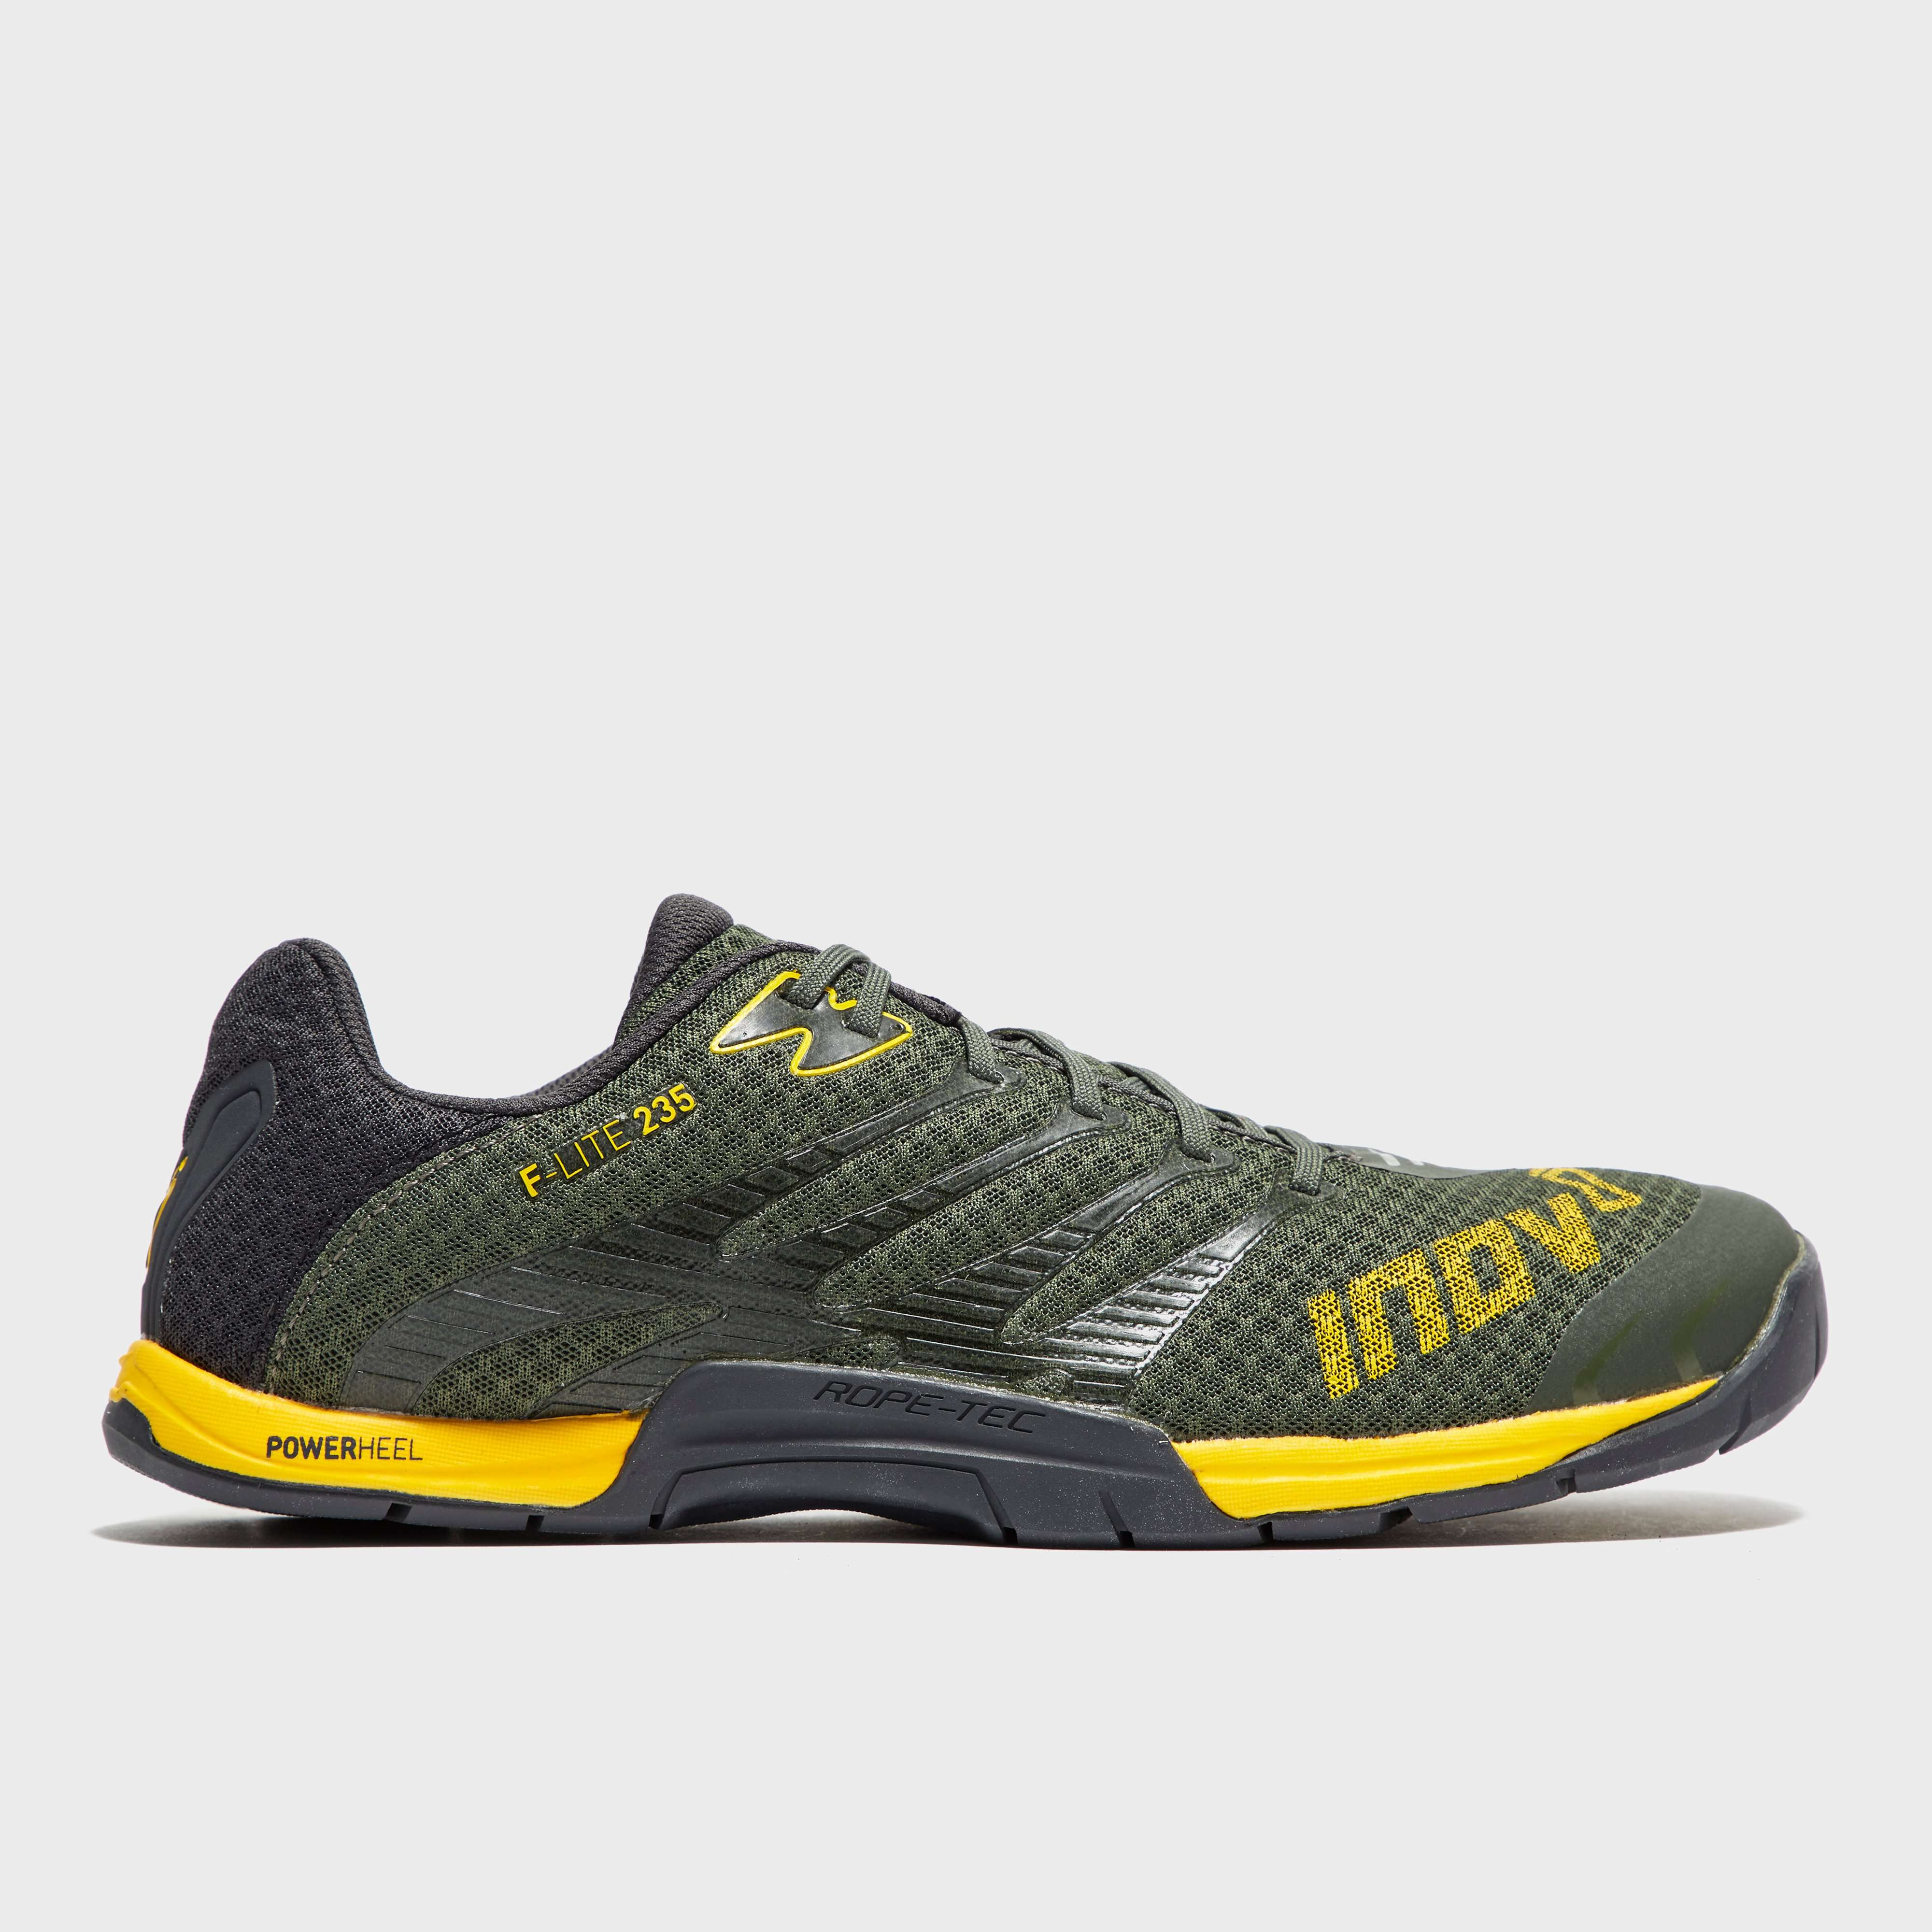 INOV-8 Men's F-Lite 235 Running Shoes